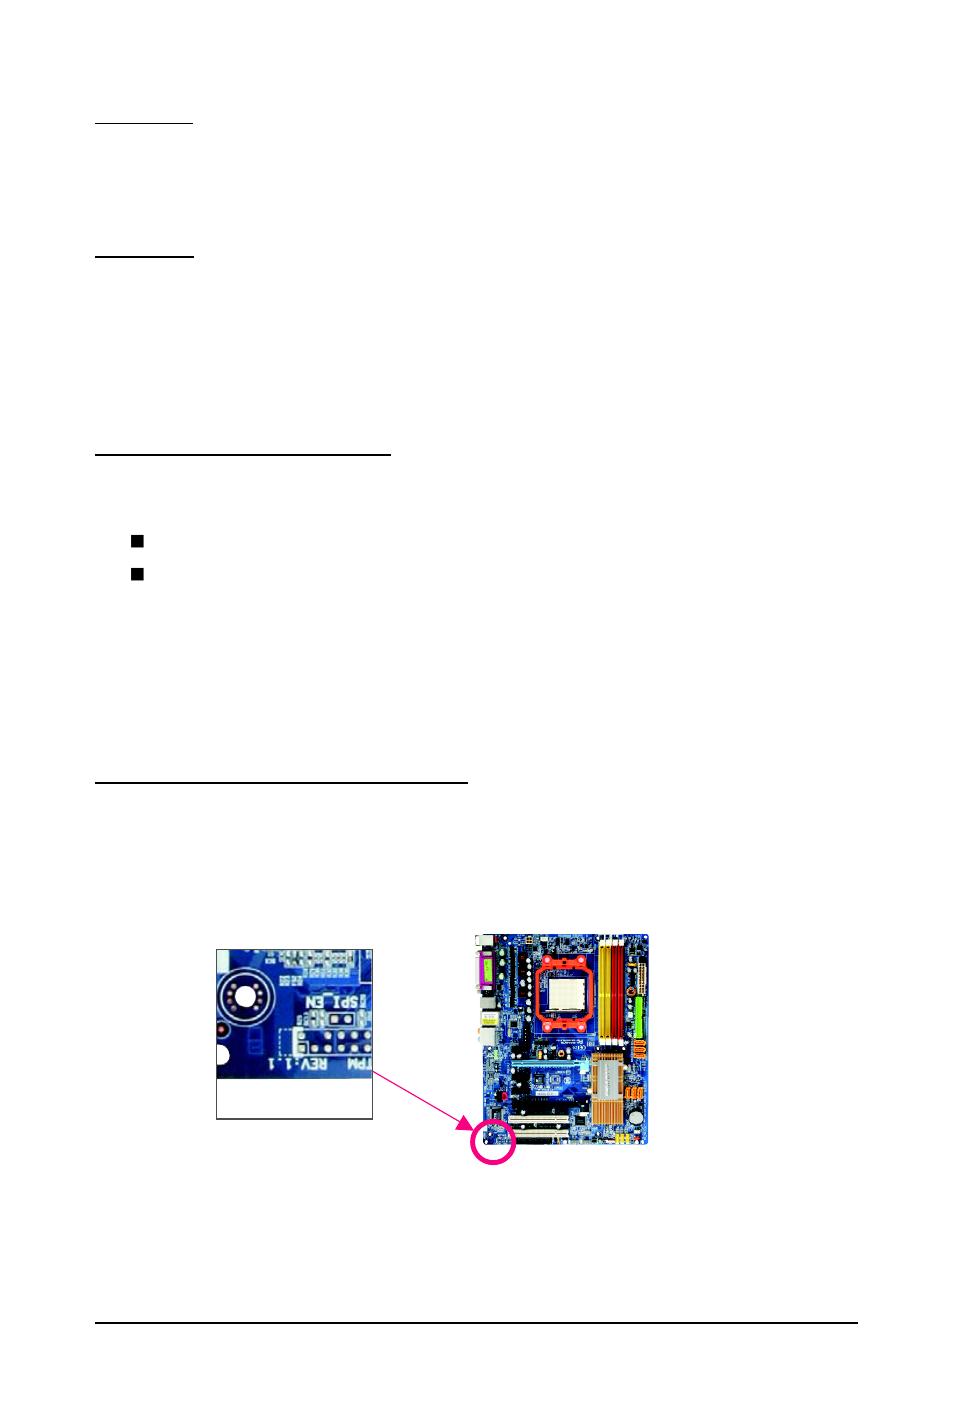 GIGABYTE GA-M61PME-S2P User Manual | Page 3 / 88